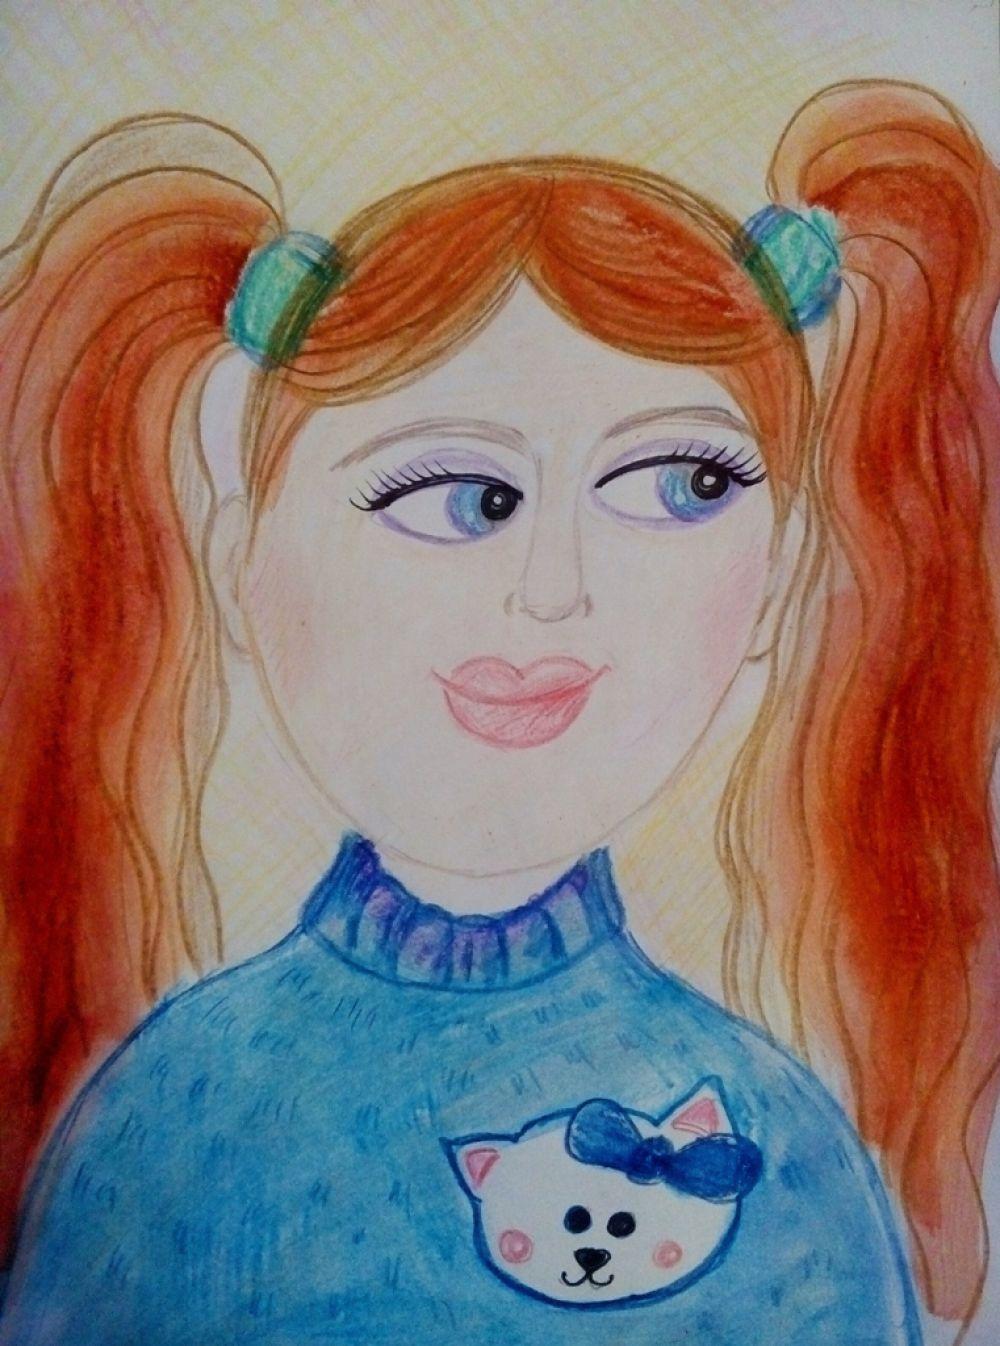 Участник №26. Торбина Екатерина